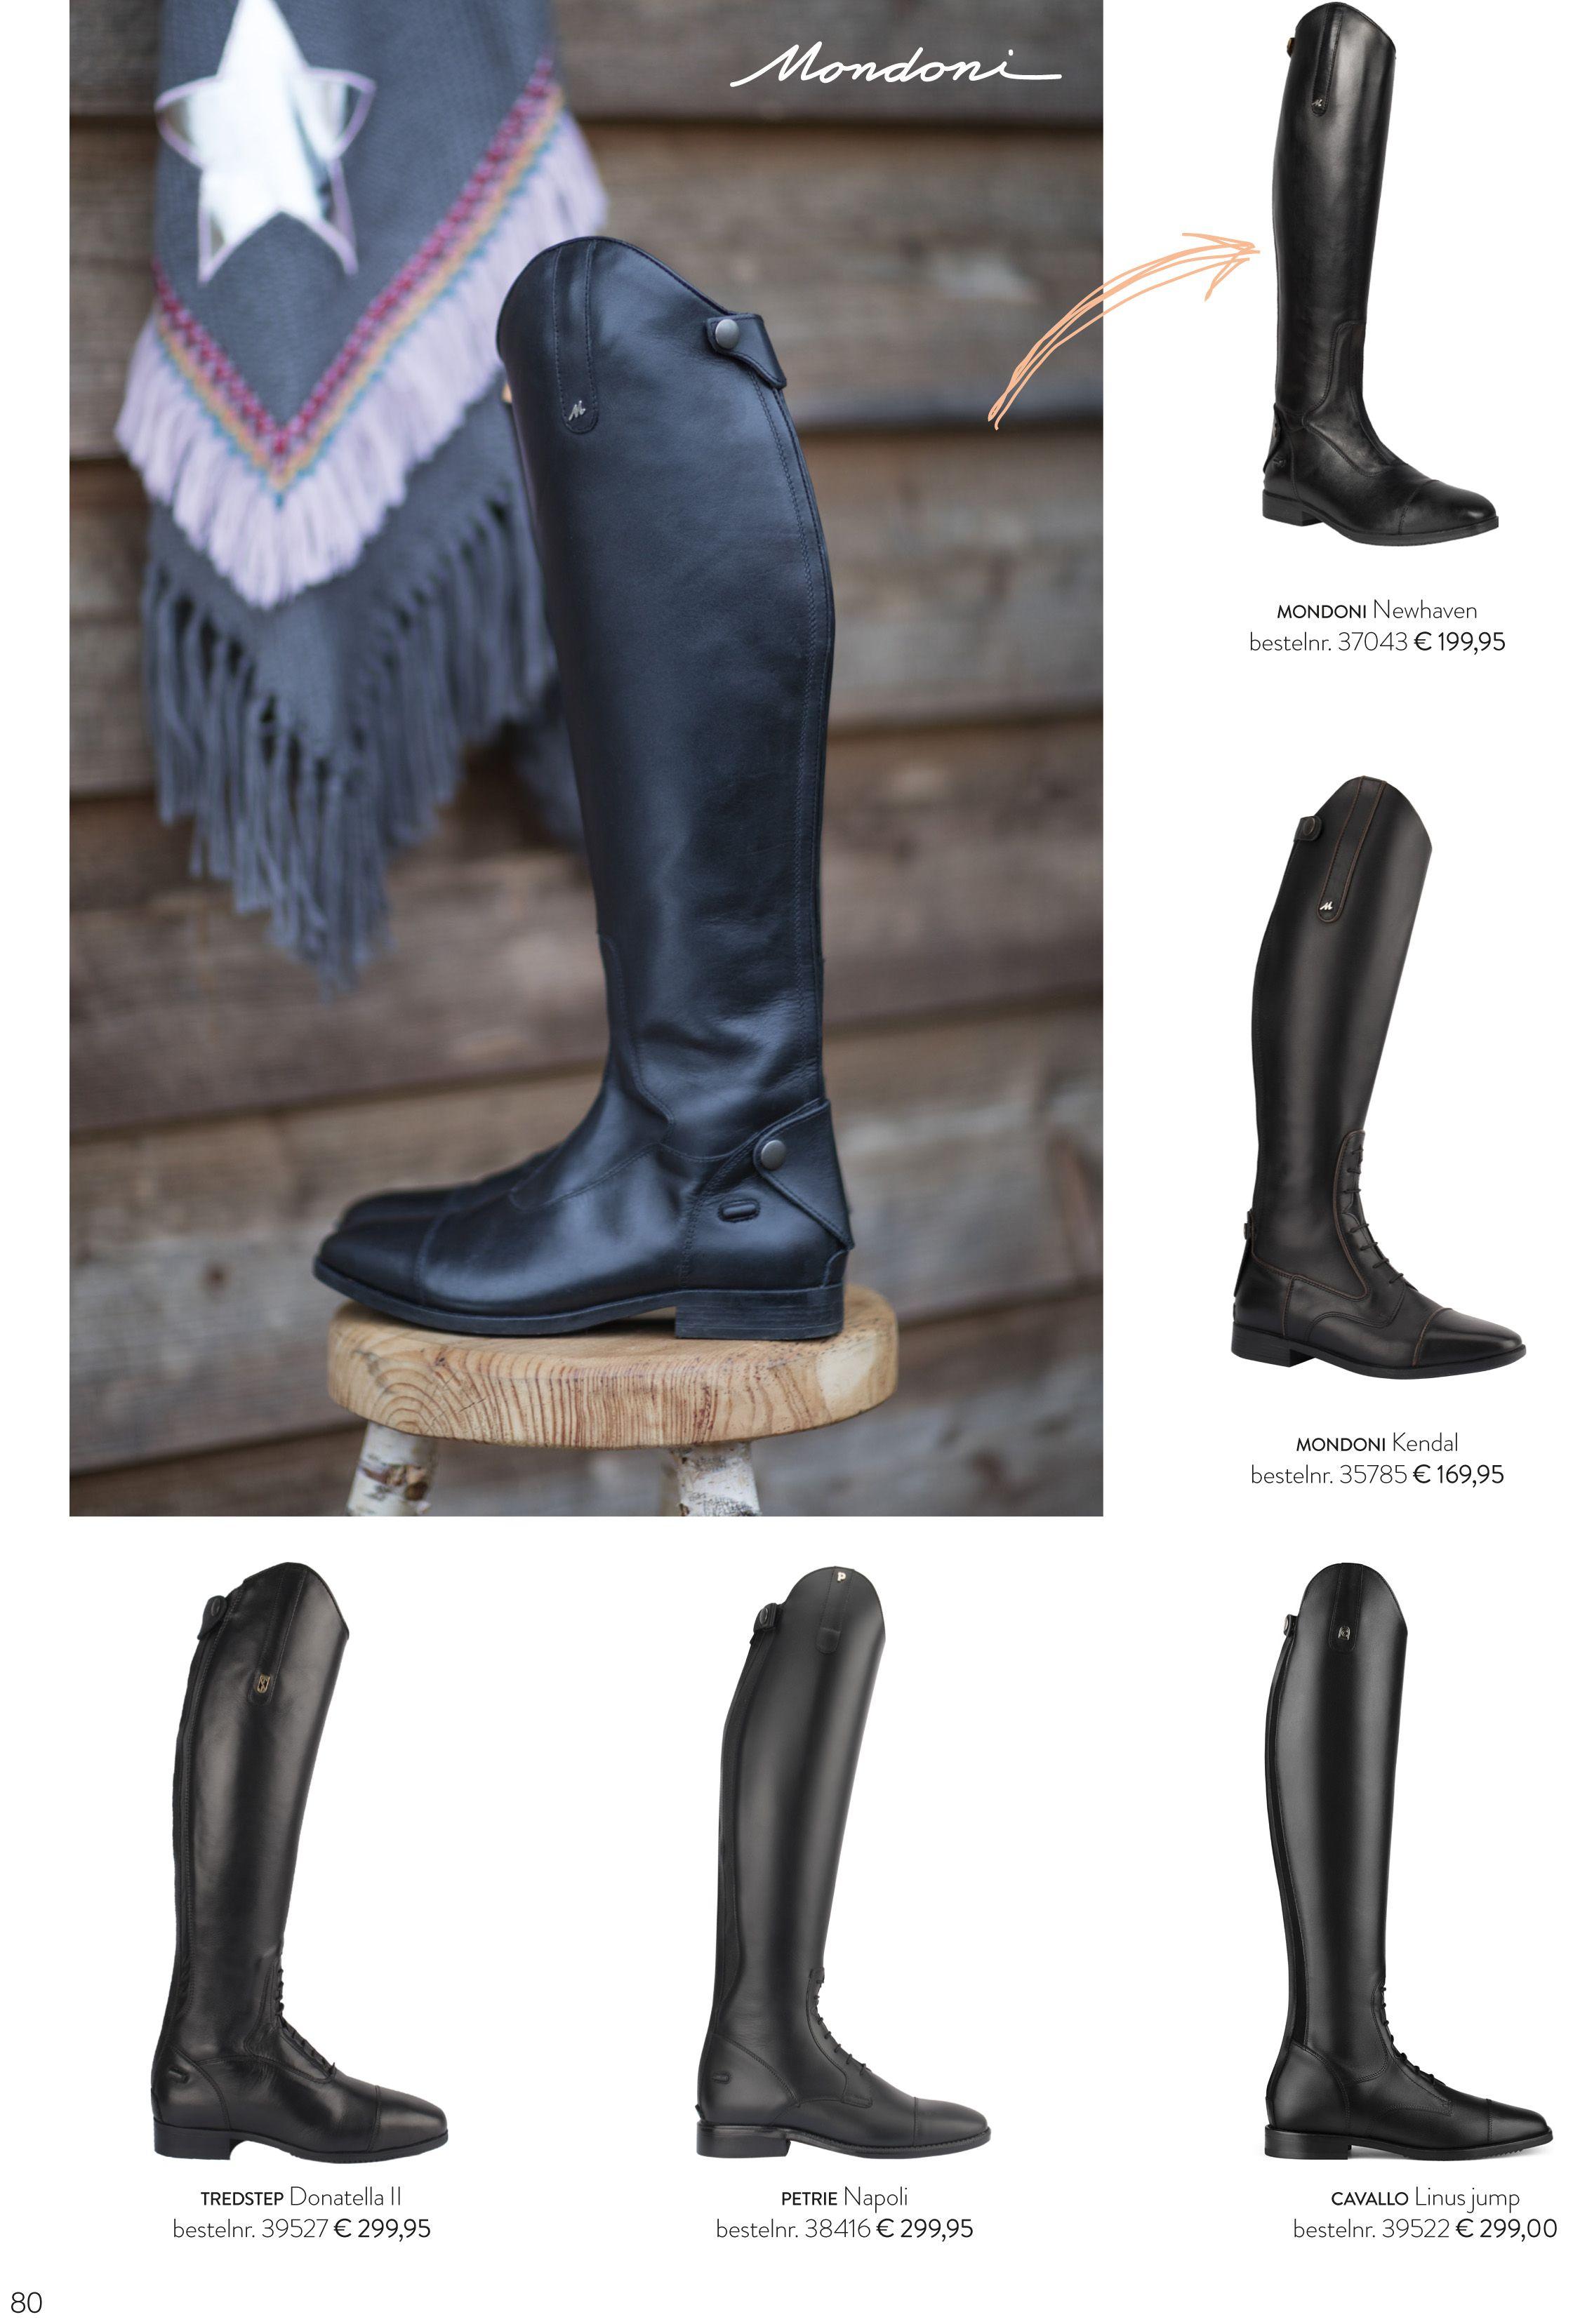 #Ridingboots #Rijlaarzen #Mondoni #Petri #Mountainhorse #Divoza